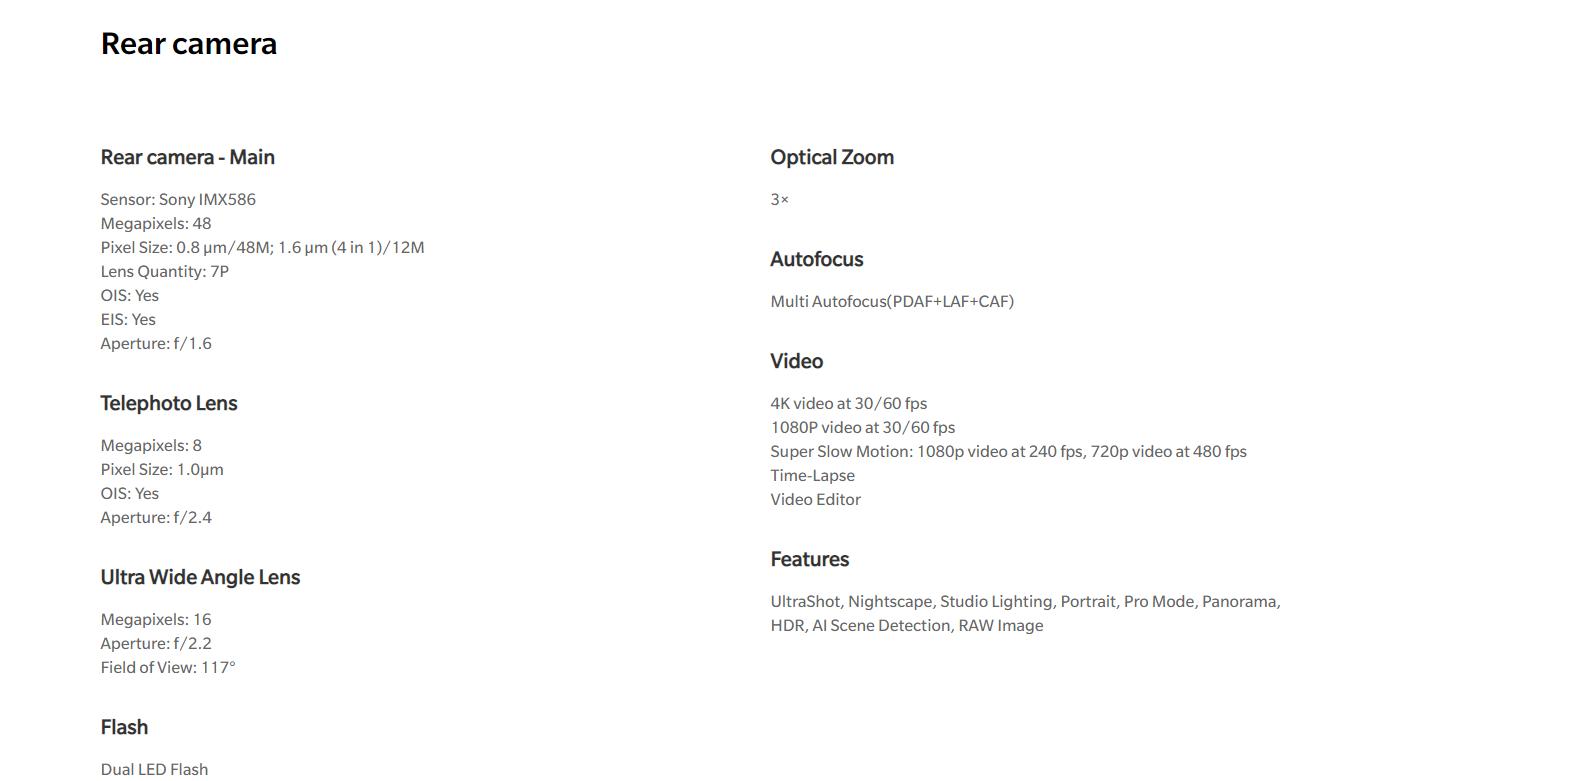 OnePlus 7 Pro 8GB RAM + 256GB STORAGE - Mirror Gray